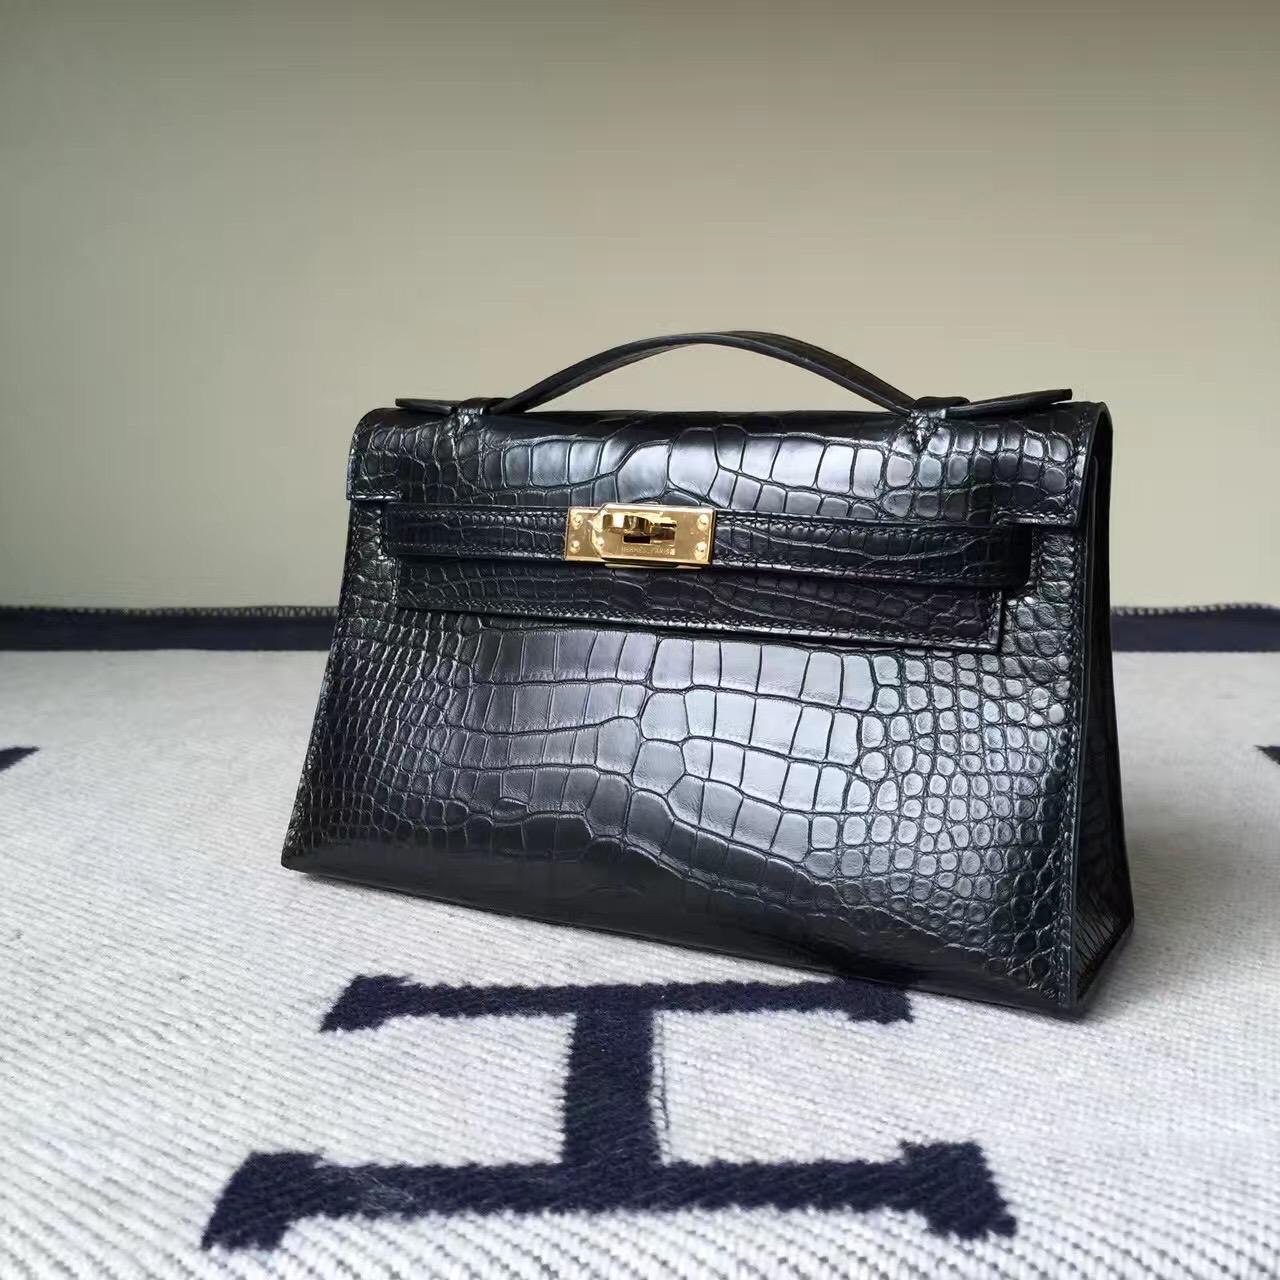 Wholesale Hermes CK89 Black Crocodile Matt Leather Minikelly Clutch Bag 22CM